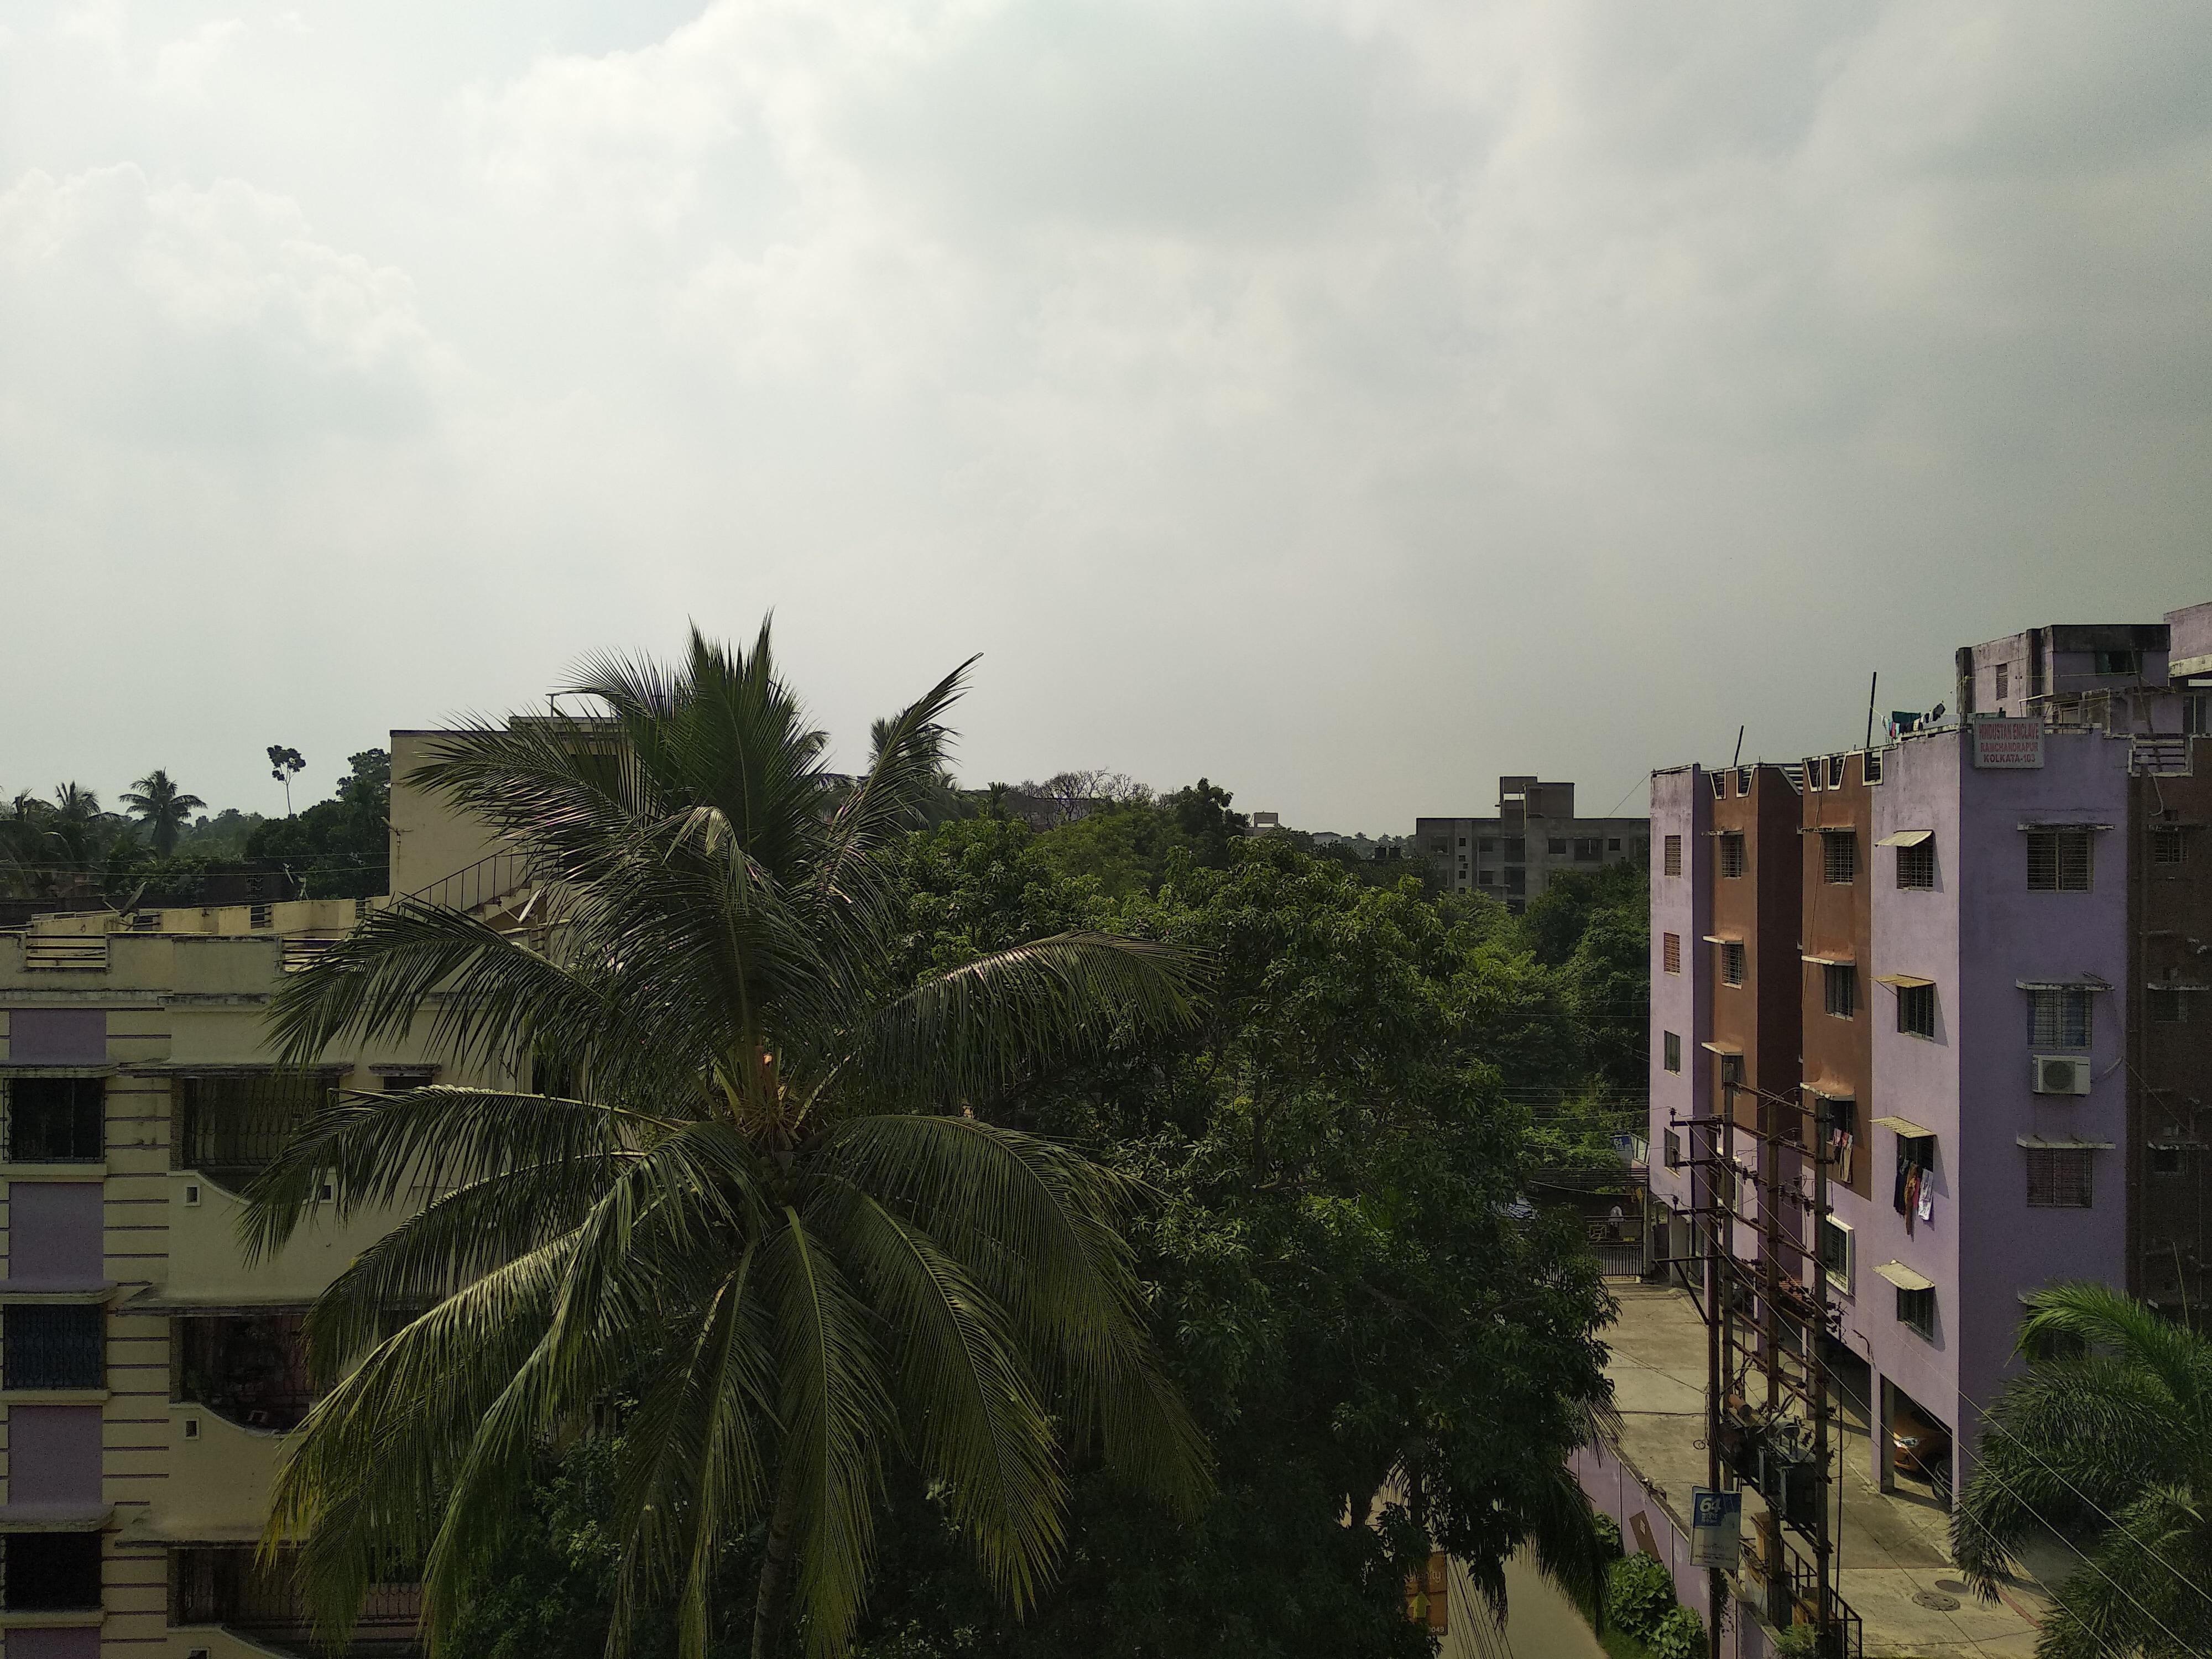 Kolkata weather update: রবিবারের কলকাতায় নেই বৃষ্টির সম্ভাবনা, জানাল আবহাওয়া দপ্তর